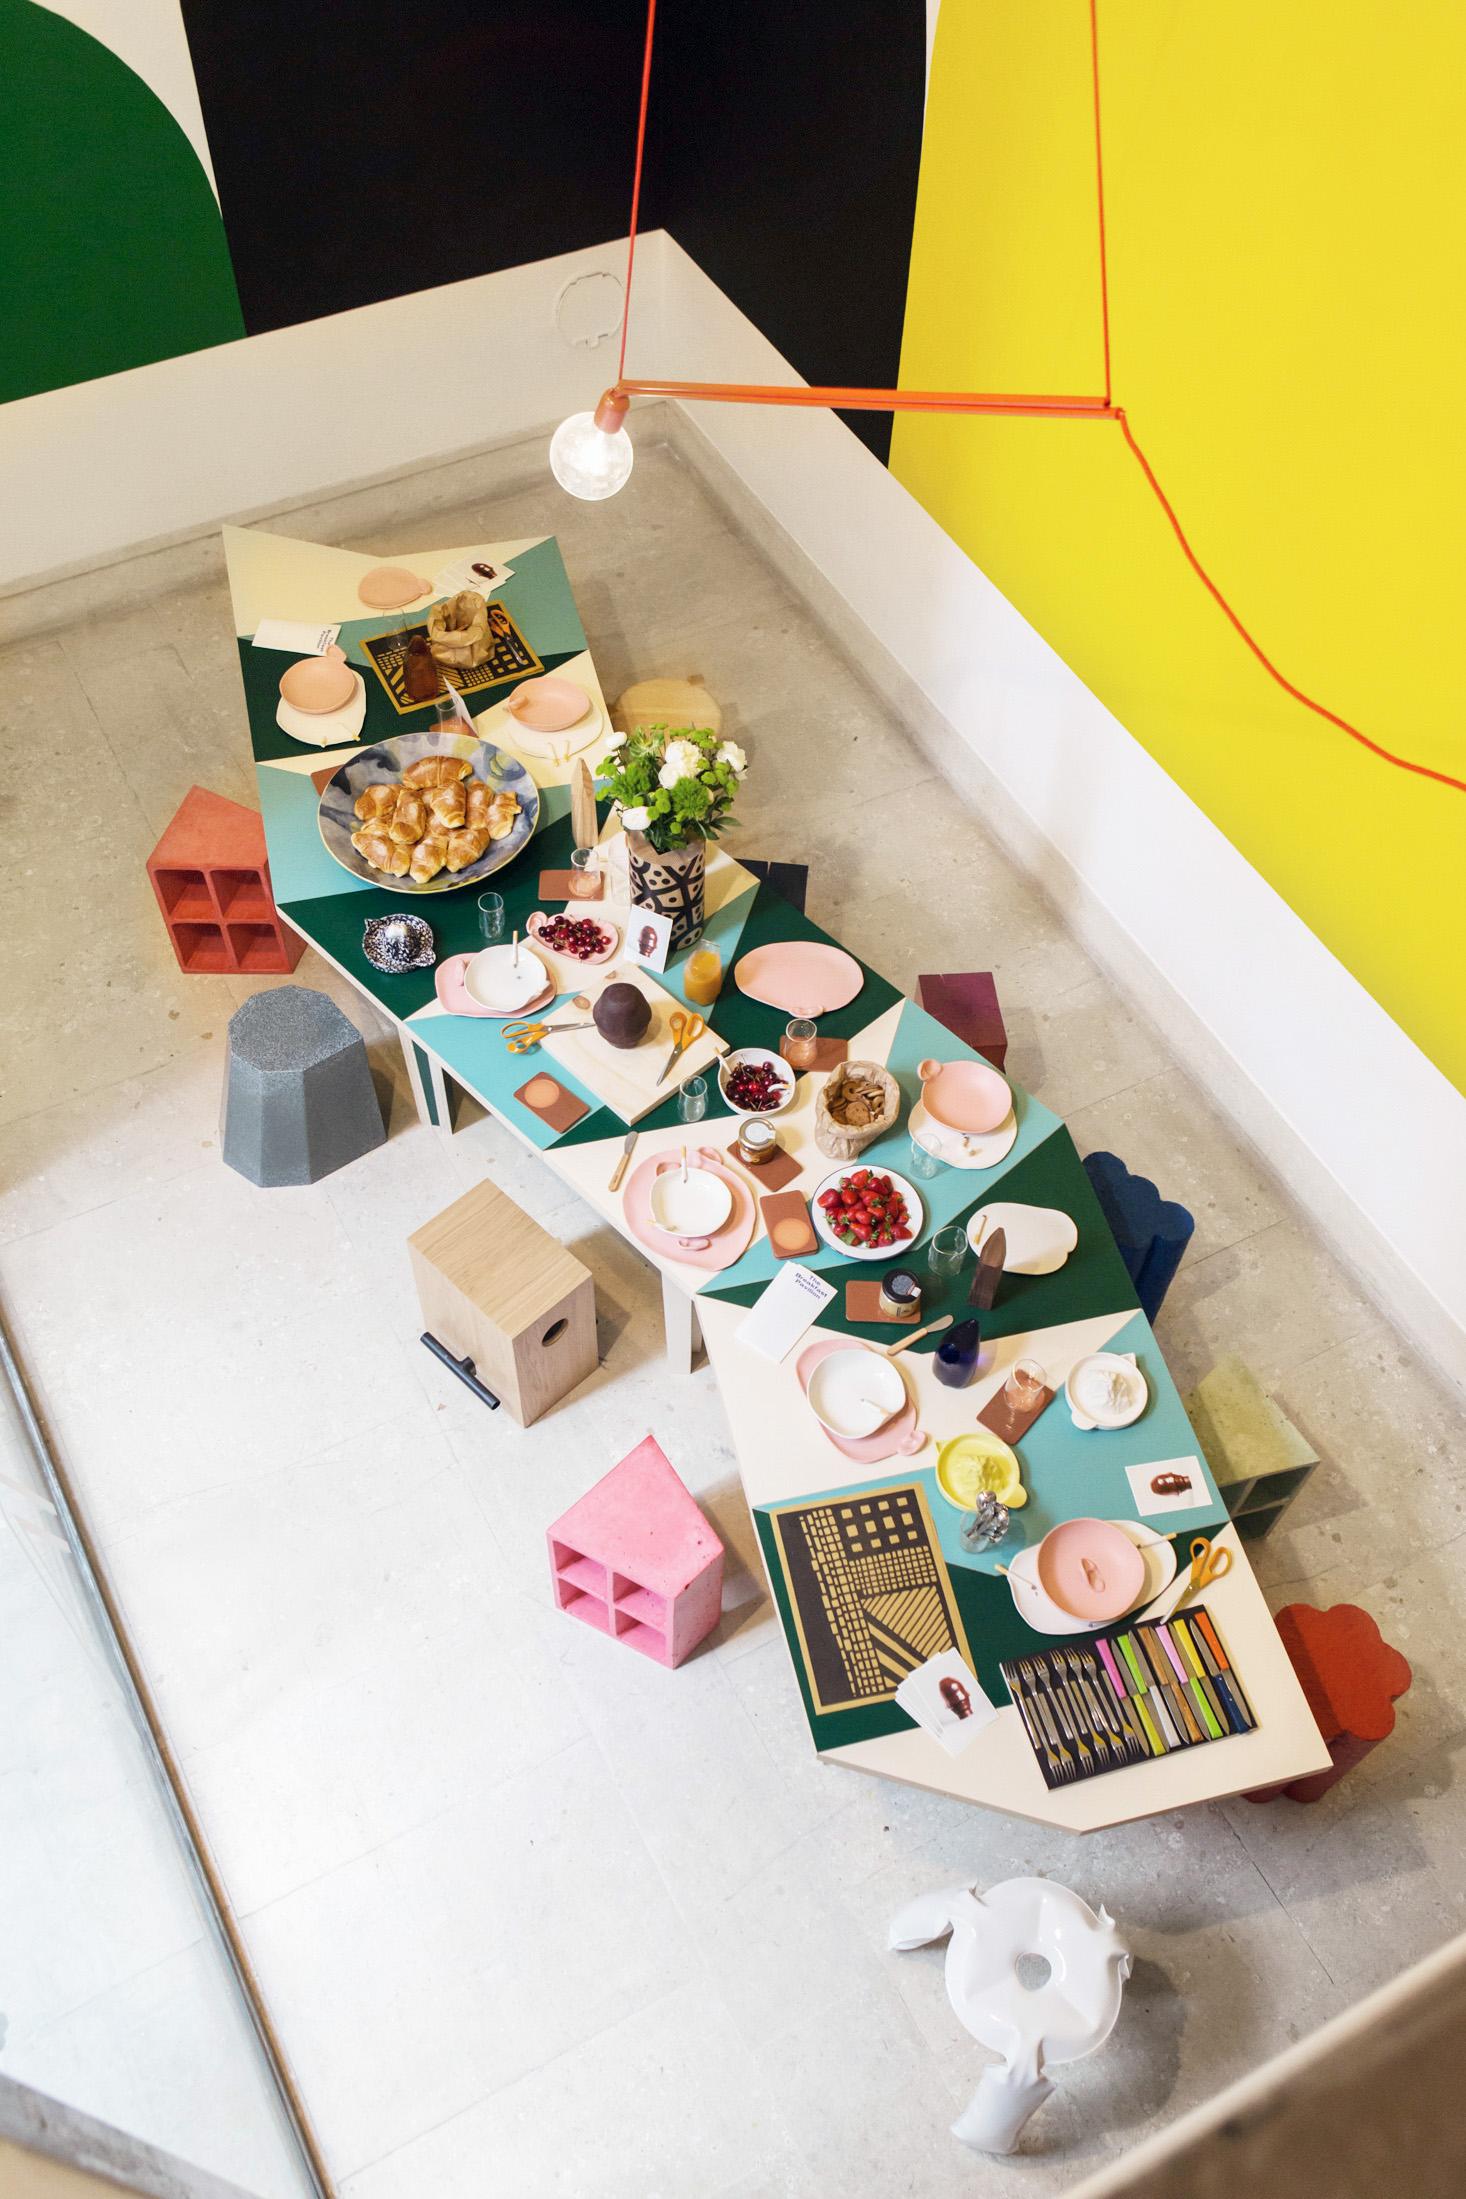 The+Breakfast+Pavilion+curated+by+M-L-XL+Office+during+the+Biennale+di+Venezia,+2017_photo_claudia_zalla-0.jpg